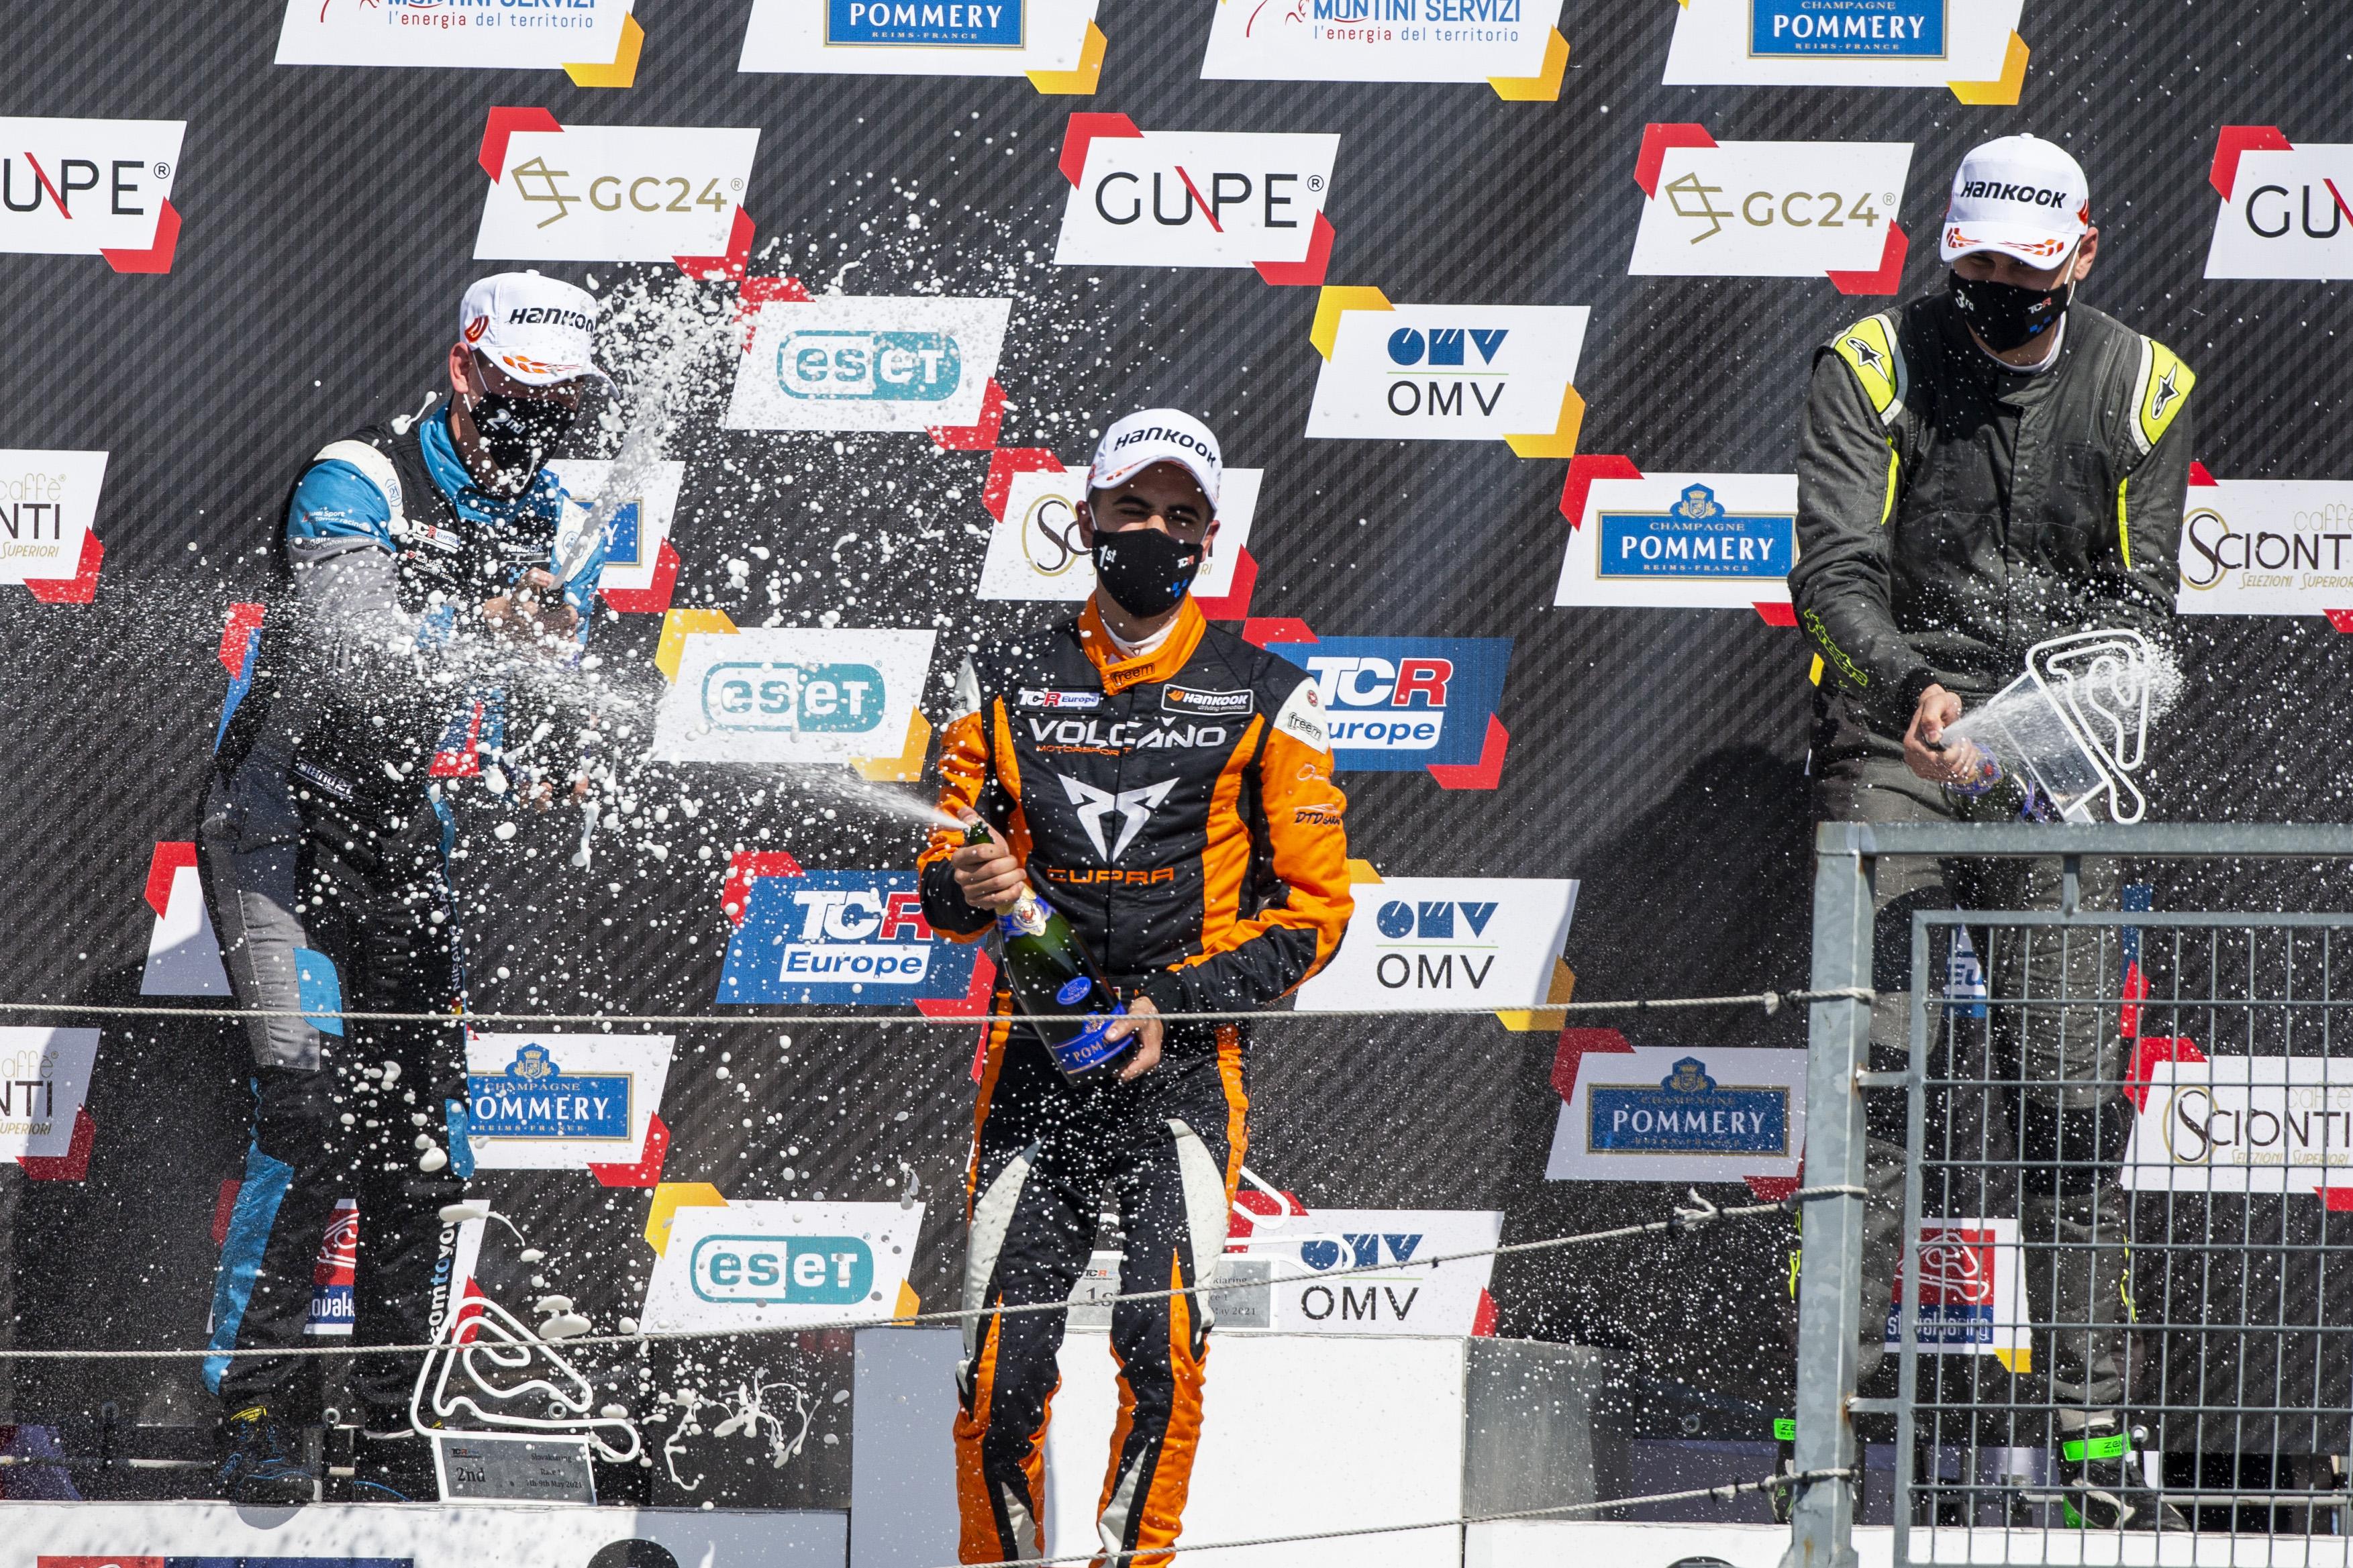 2021-2021_slovakiaring_race_1---2021_tcr_europe_slovakiaring_race_1_champagne_31.jpg